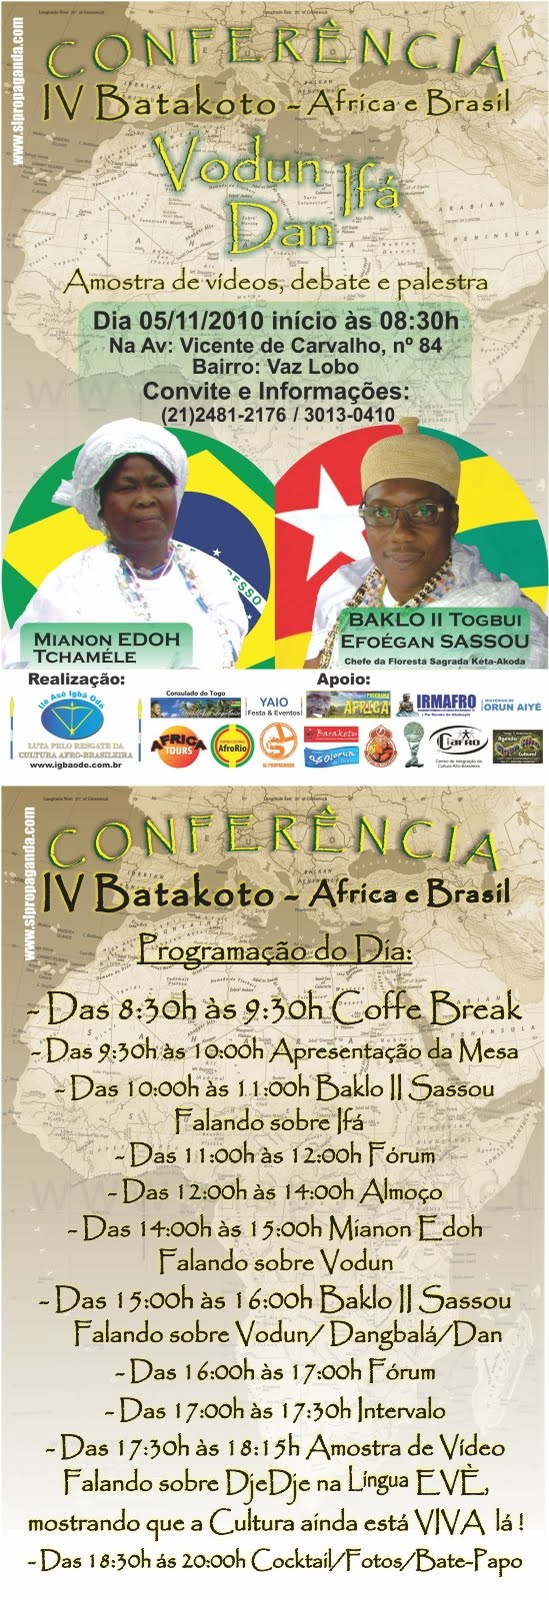 'IV Conferência Batakoto África e Brasil - Vodun, Ifá, Dan'